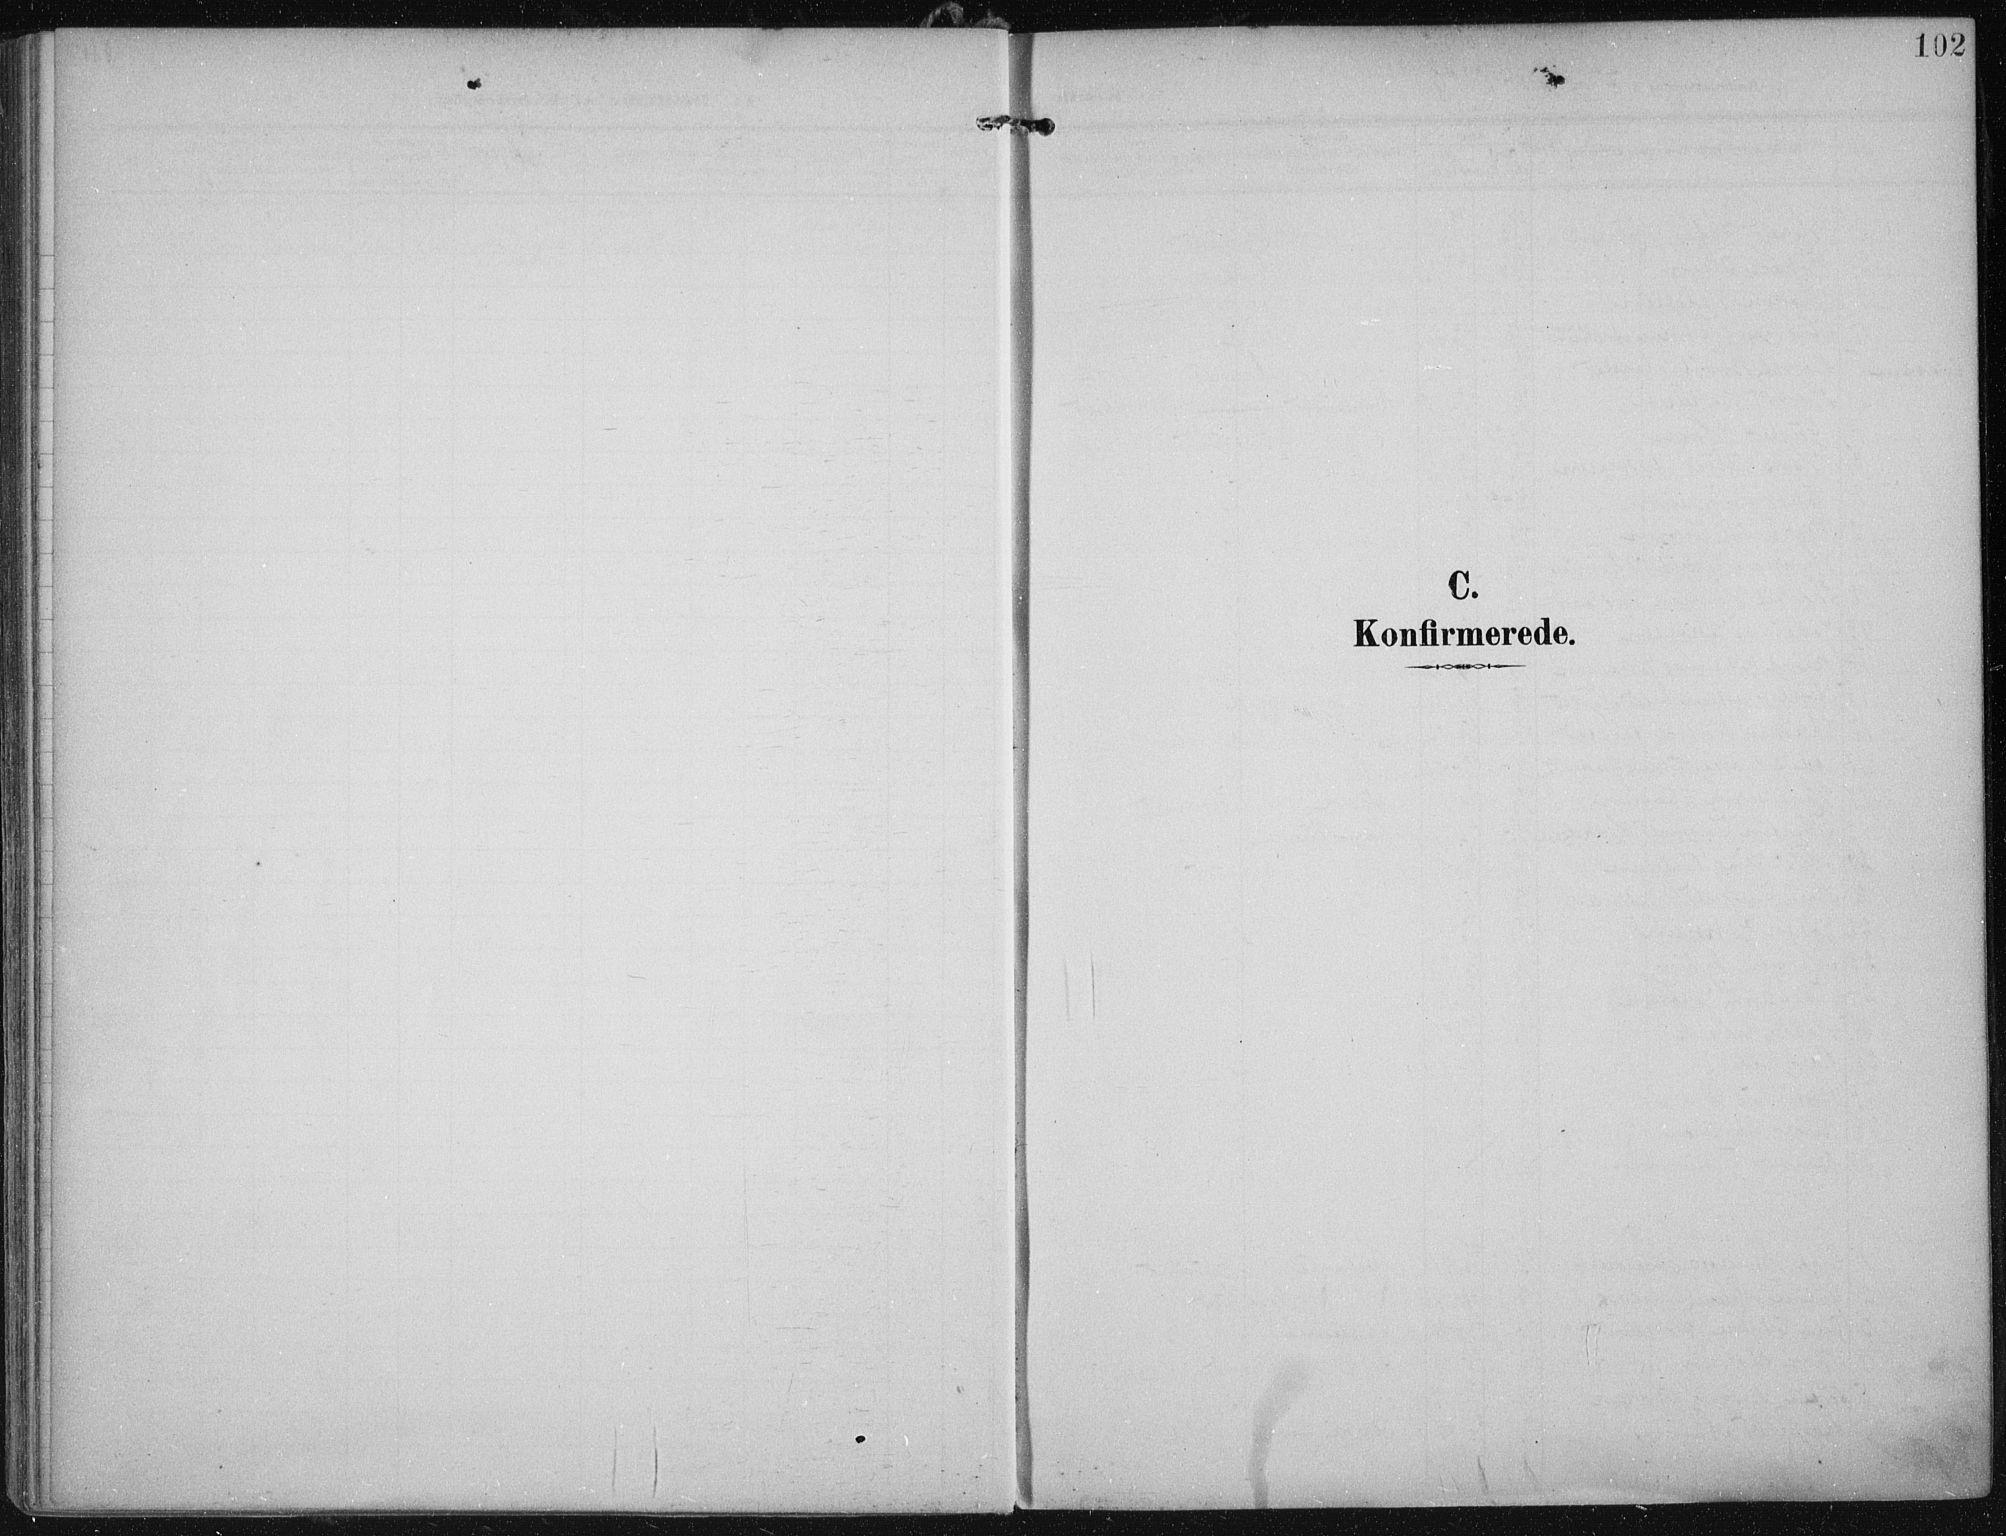 SAST, Egersund sokneprestkontor, Ministerialbok nr. A 21, 1905-1928, s. 102